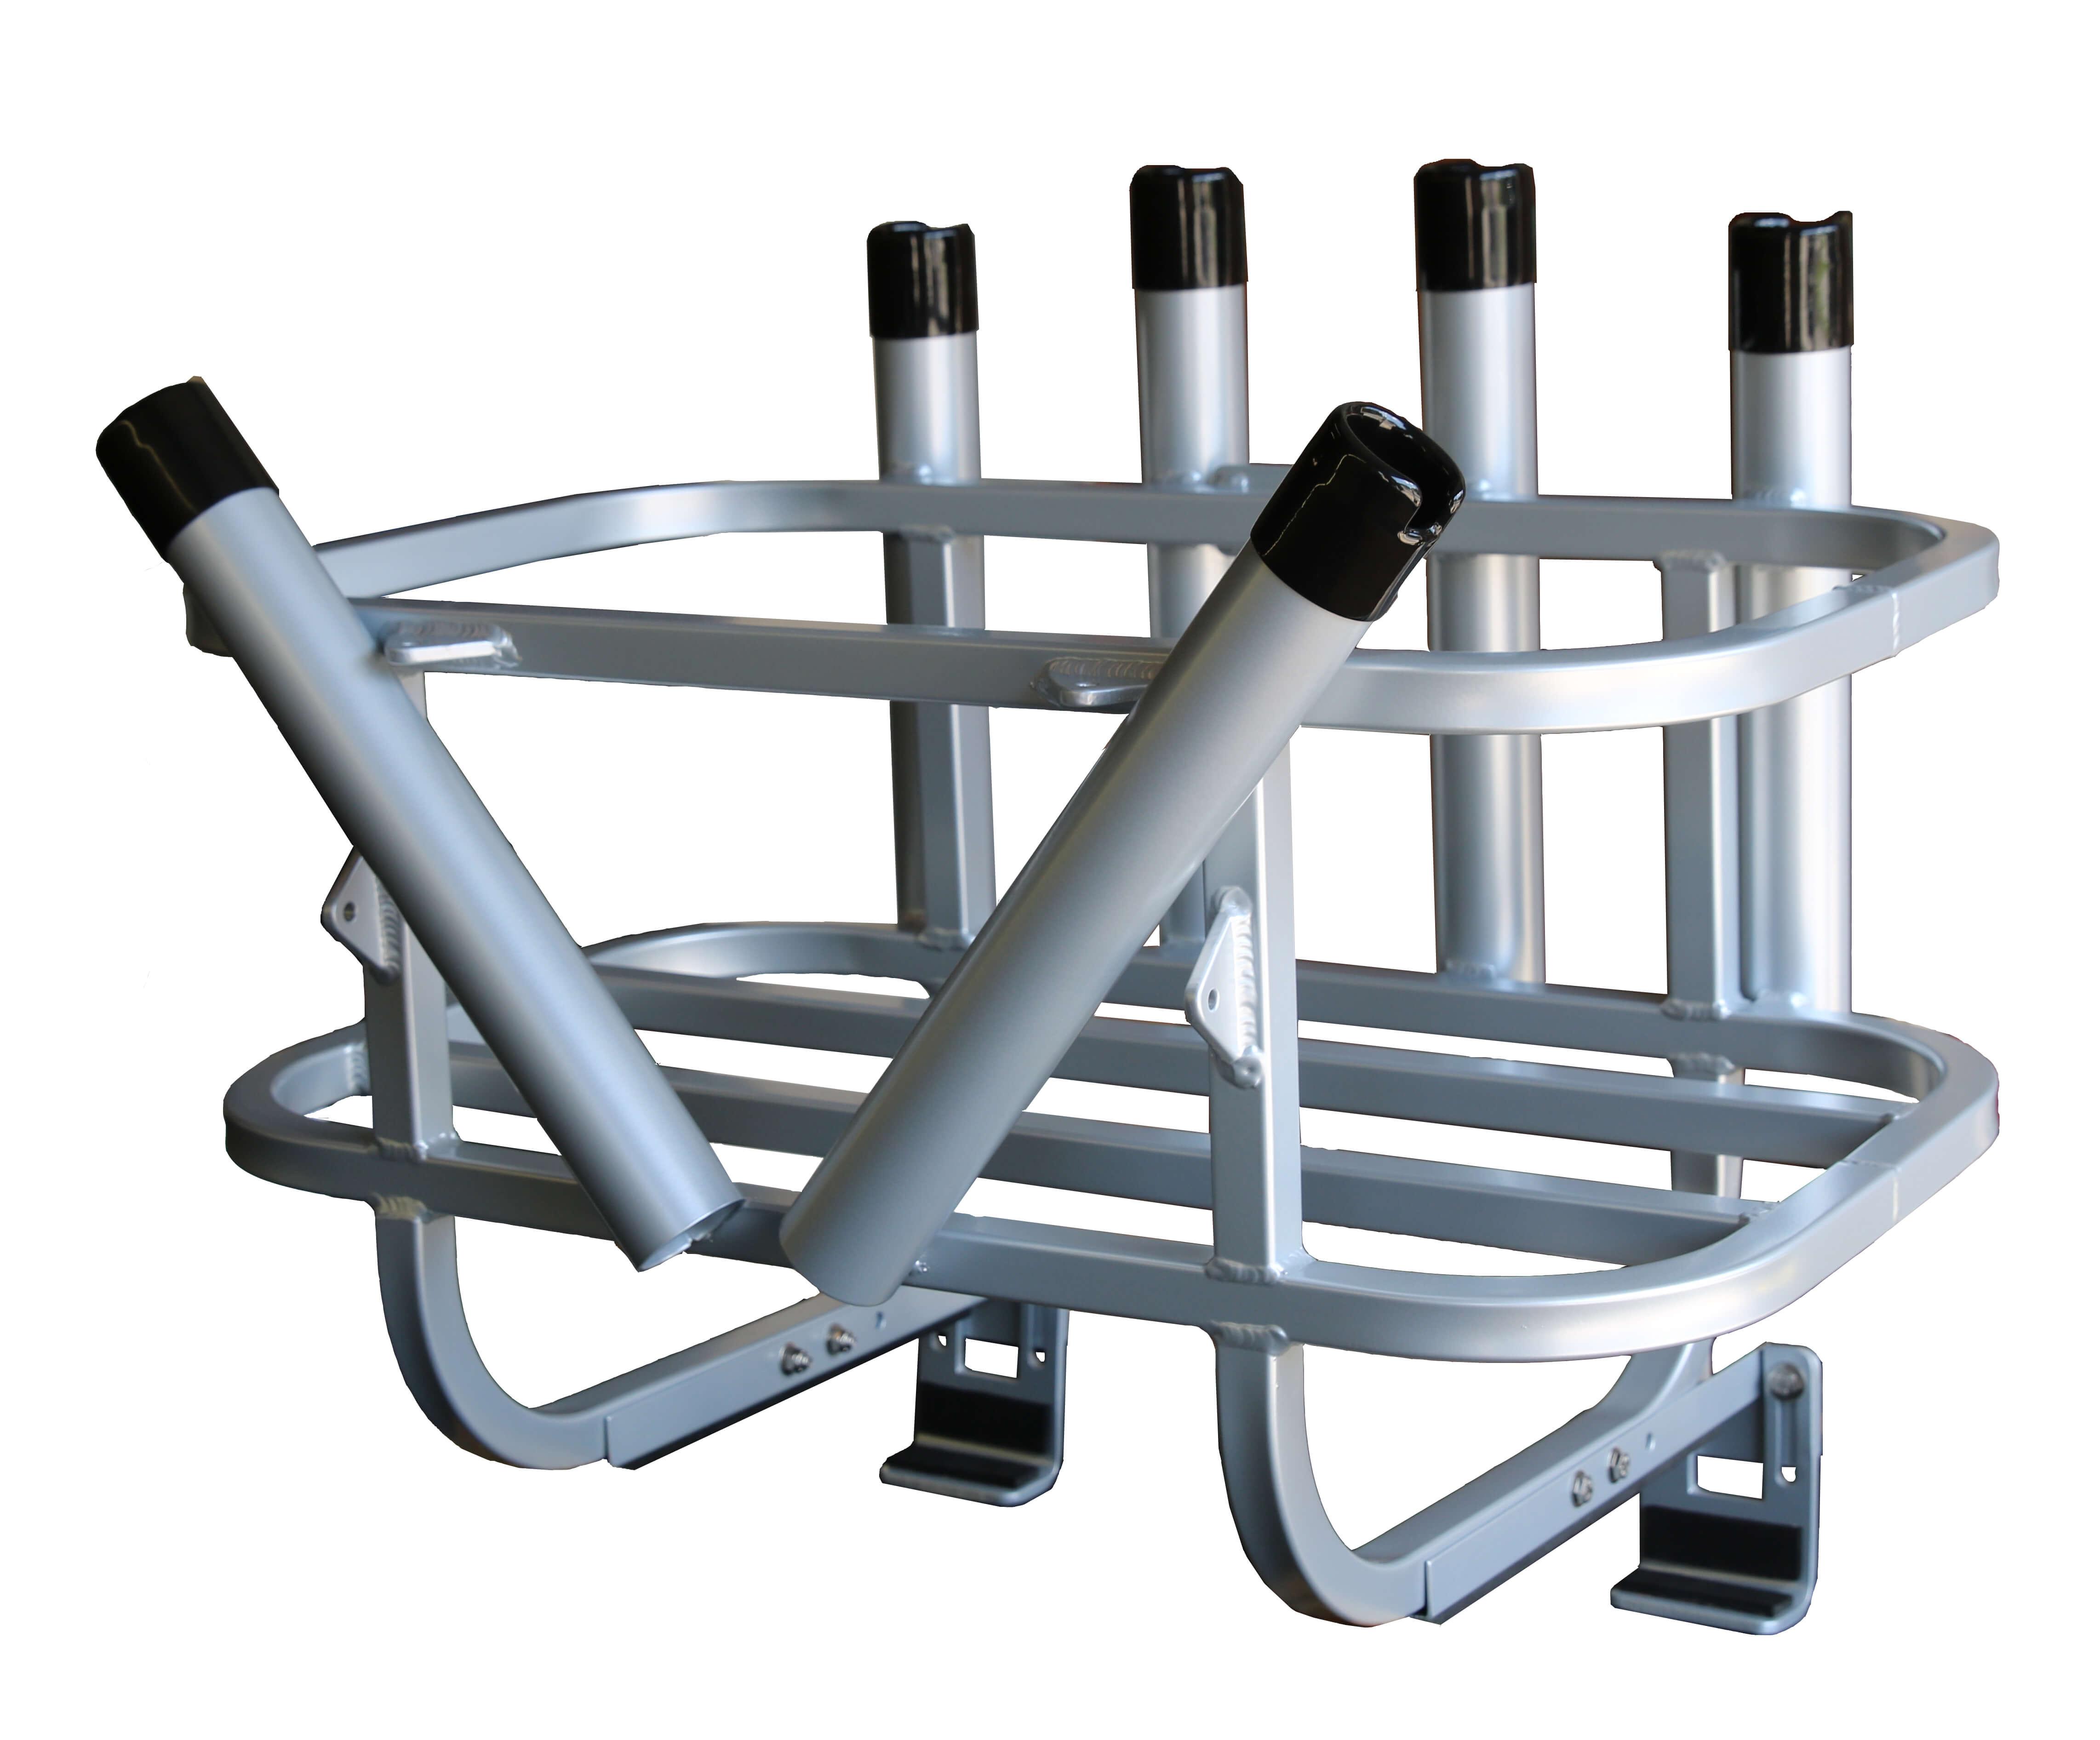 Jet ski rod rack cooler holder ski leg design plattinum for Jetski fishing rack